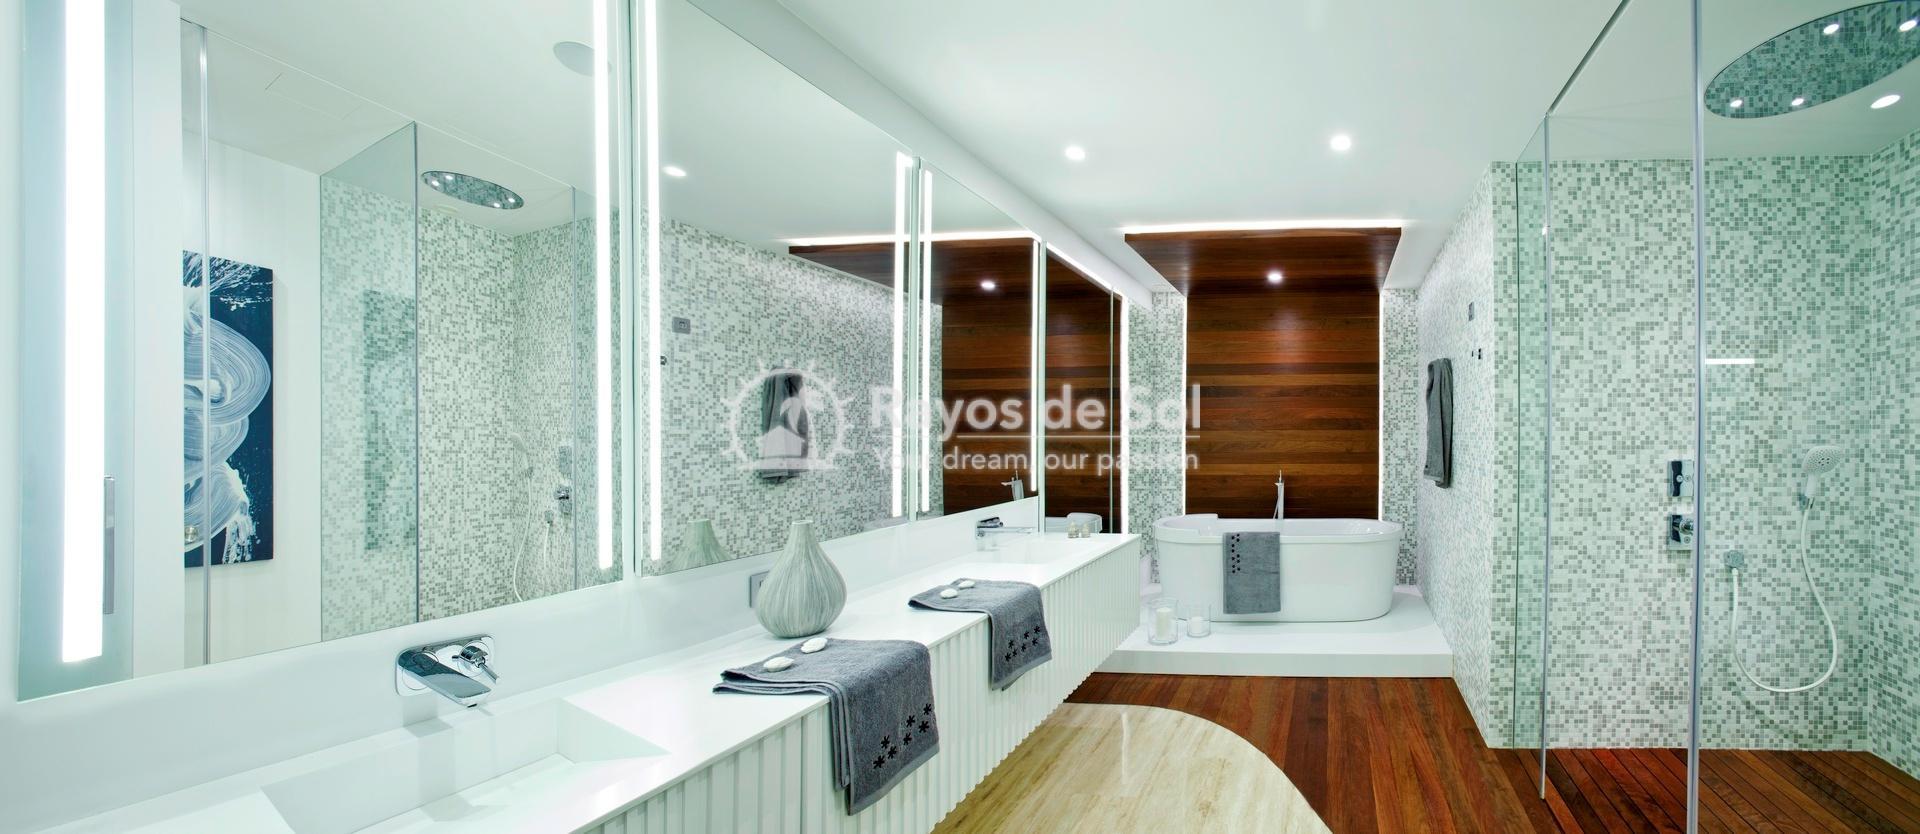 Very exclusive apartment  in Altea Hills, Altea, Costa Blanca (AHVAOS) - 21